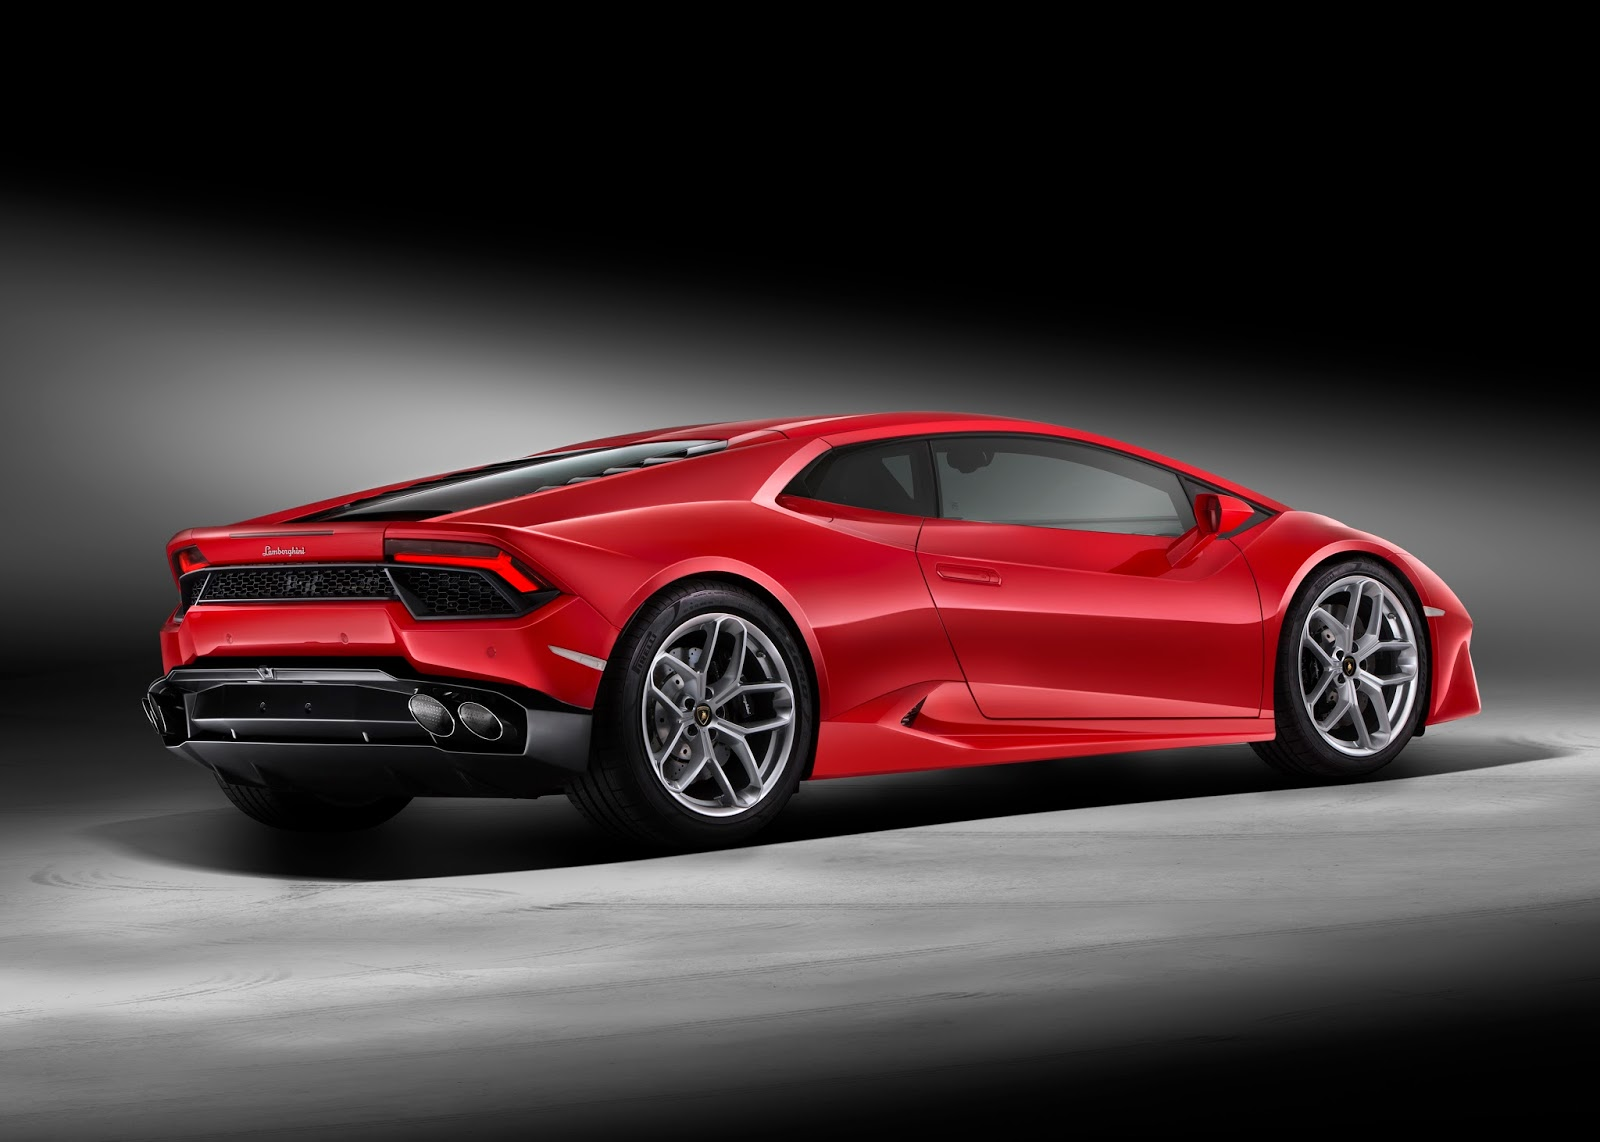 409536 Lamborghini Huracan LP580-2 : Η πιο fun to drive Lamborghini είναι πισωκίνητη και η φθηνότερη Lamborghini, Lamborghini Huracan, Lamborghini Huracan LP580-2, supercars, videos